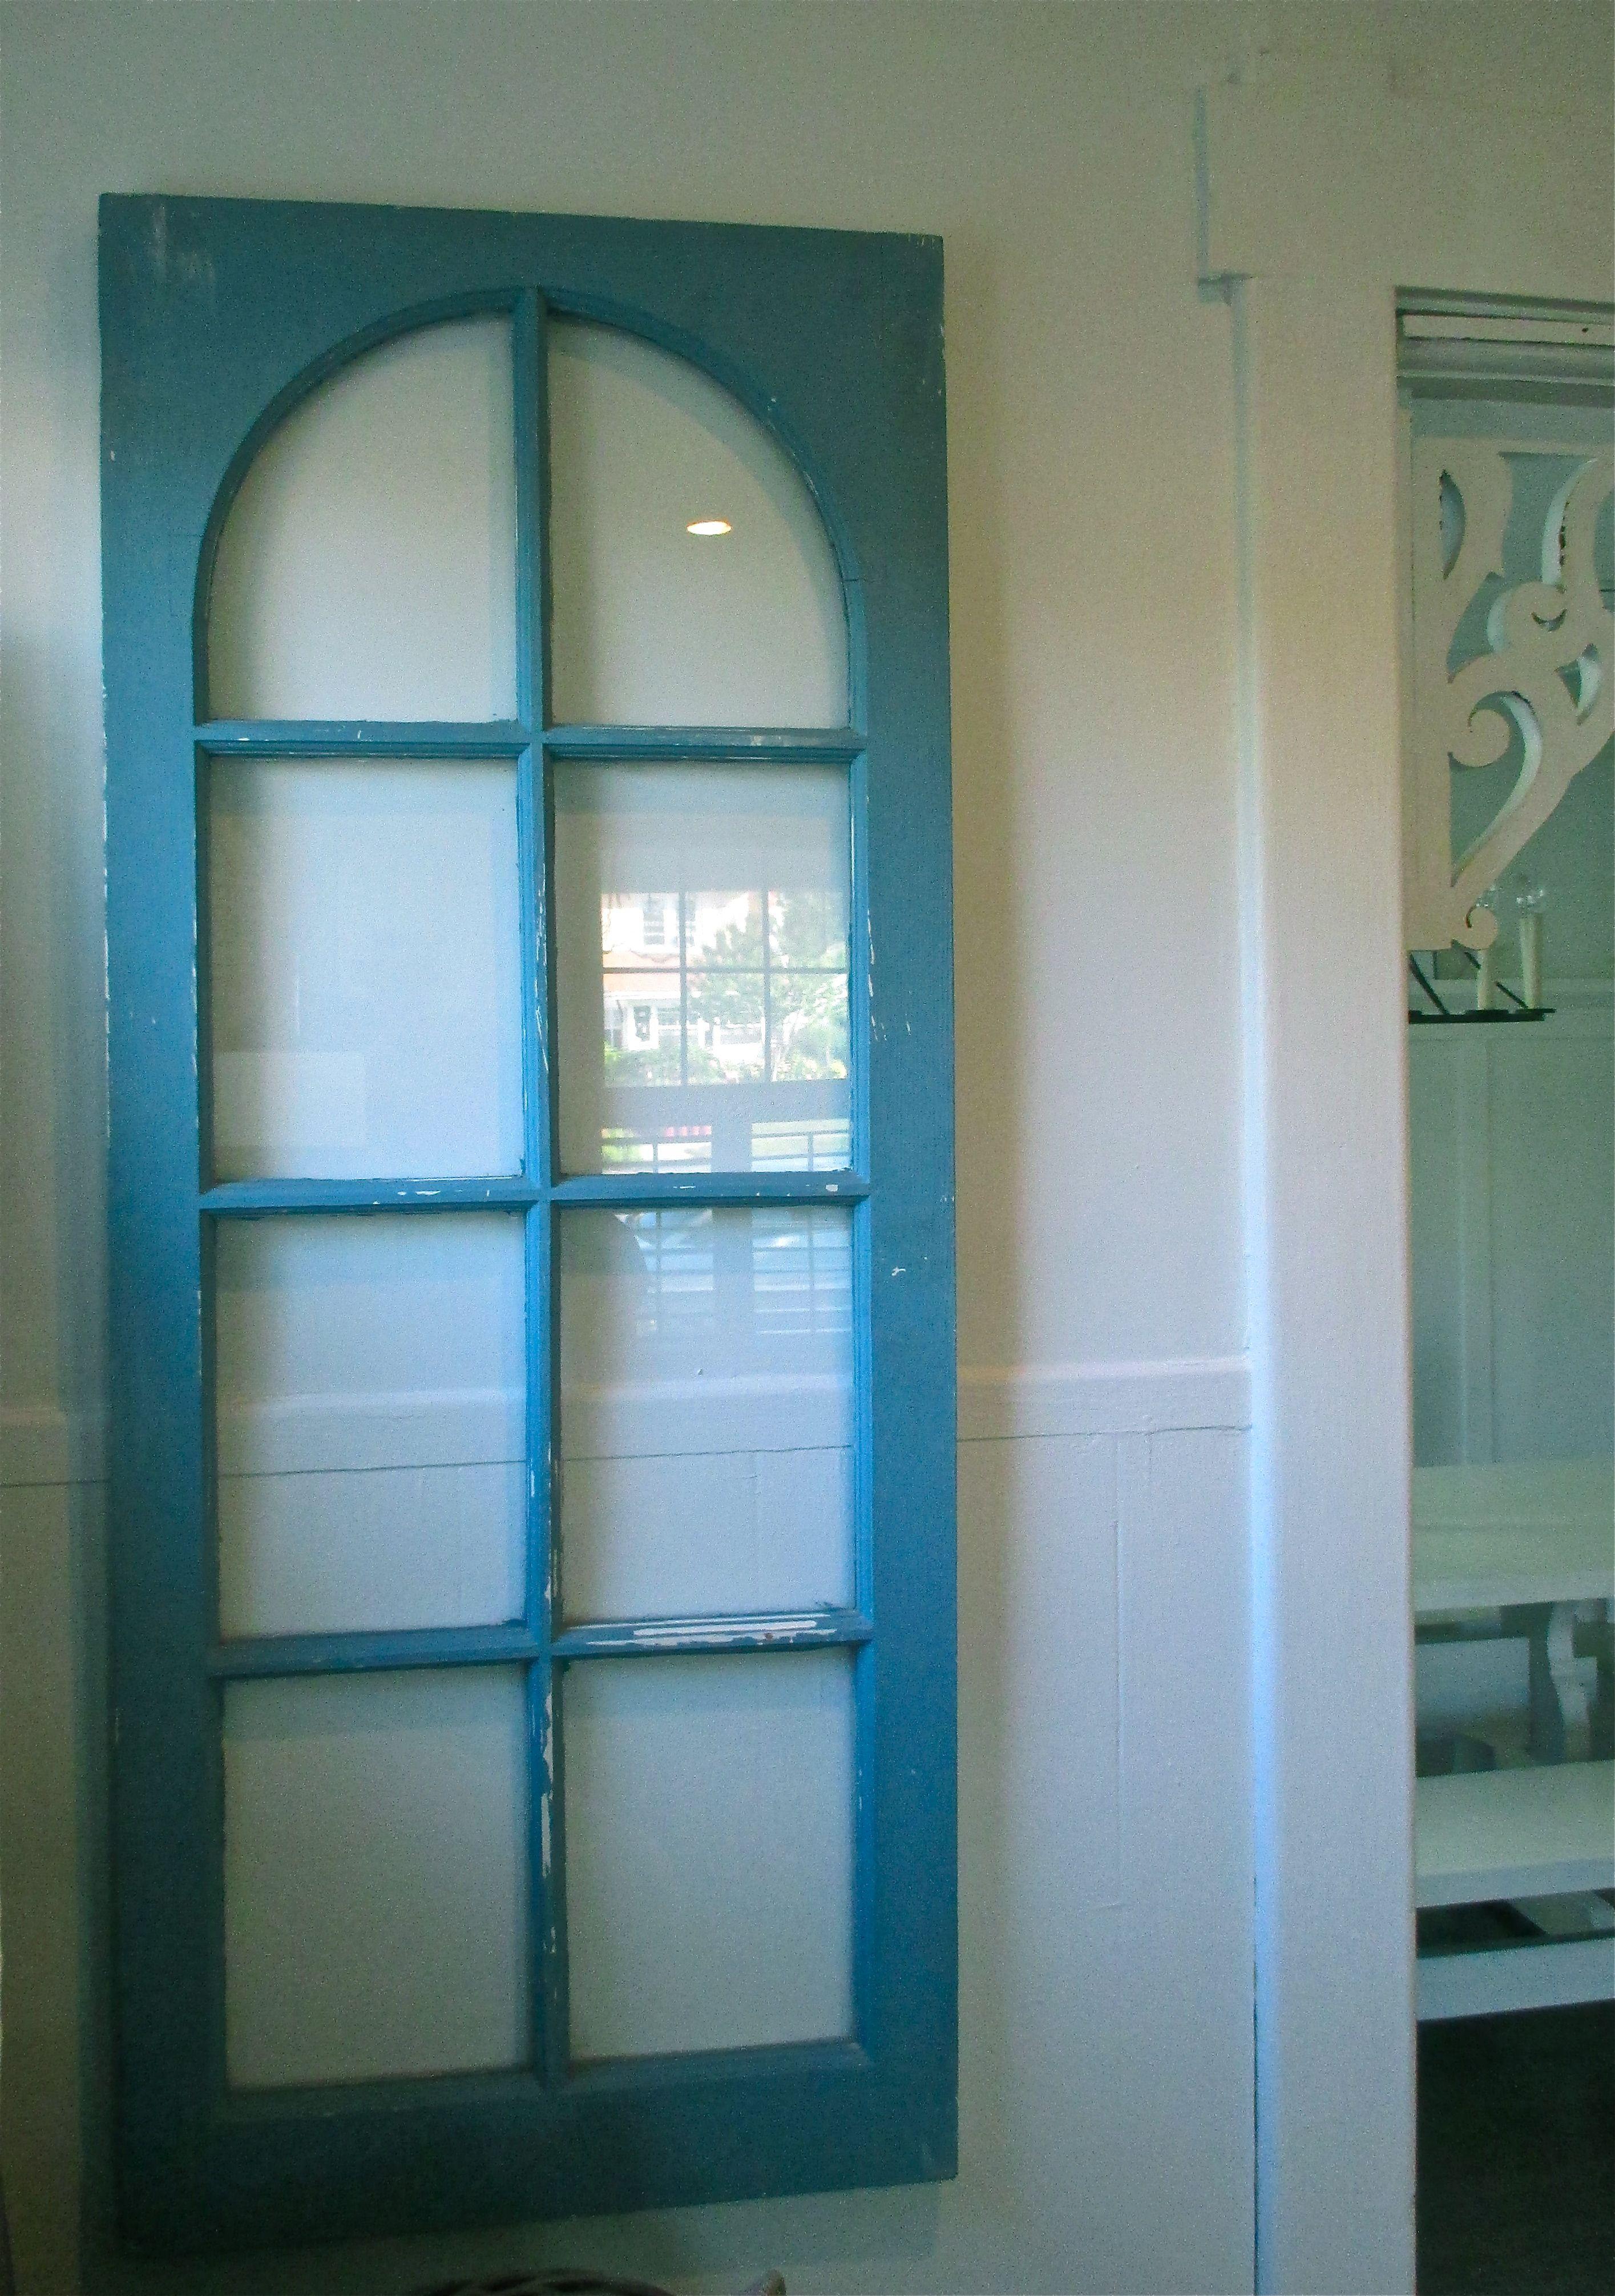 Hallway mirror kmart  one of  free antique windows  I finally got my Beach House